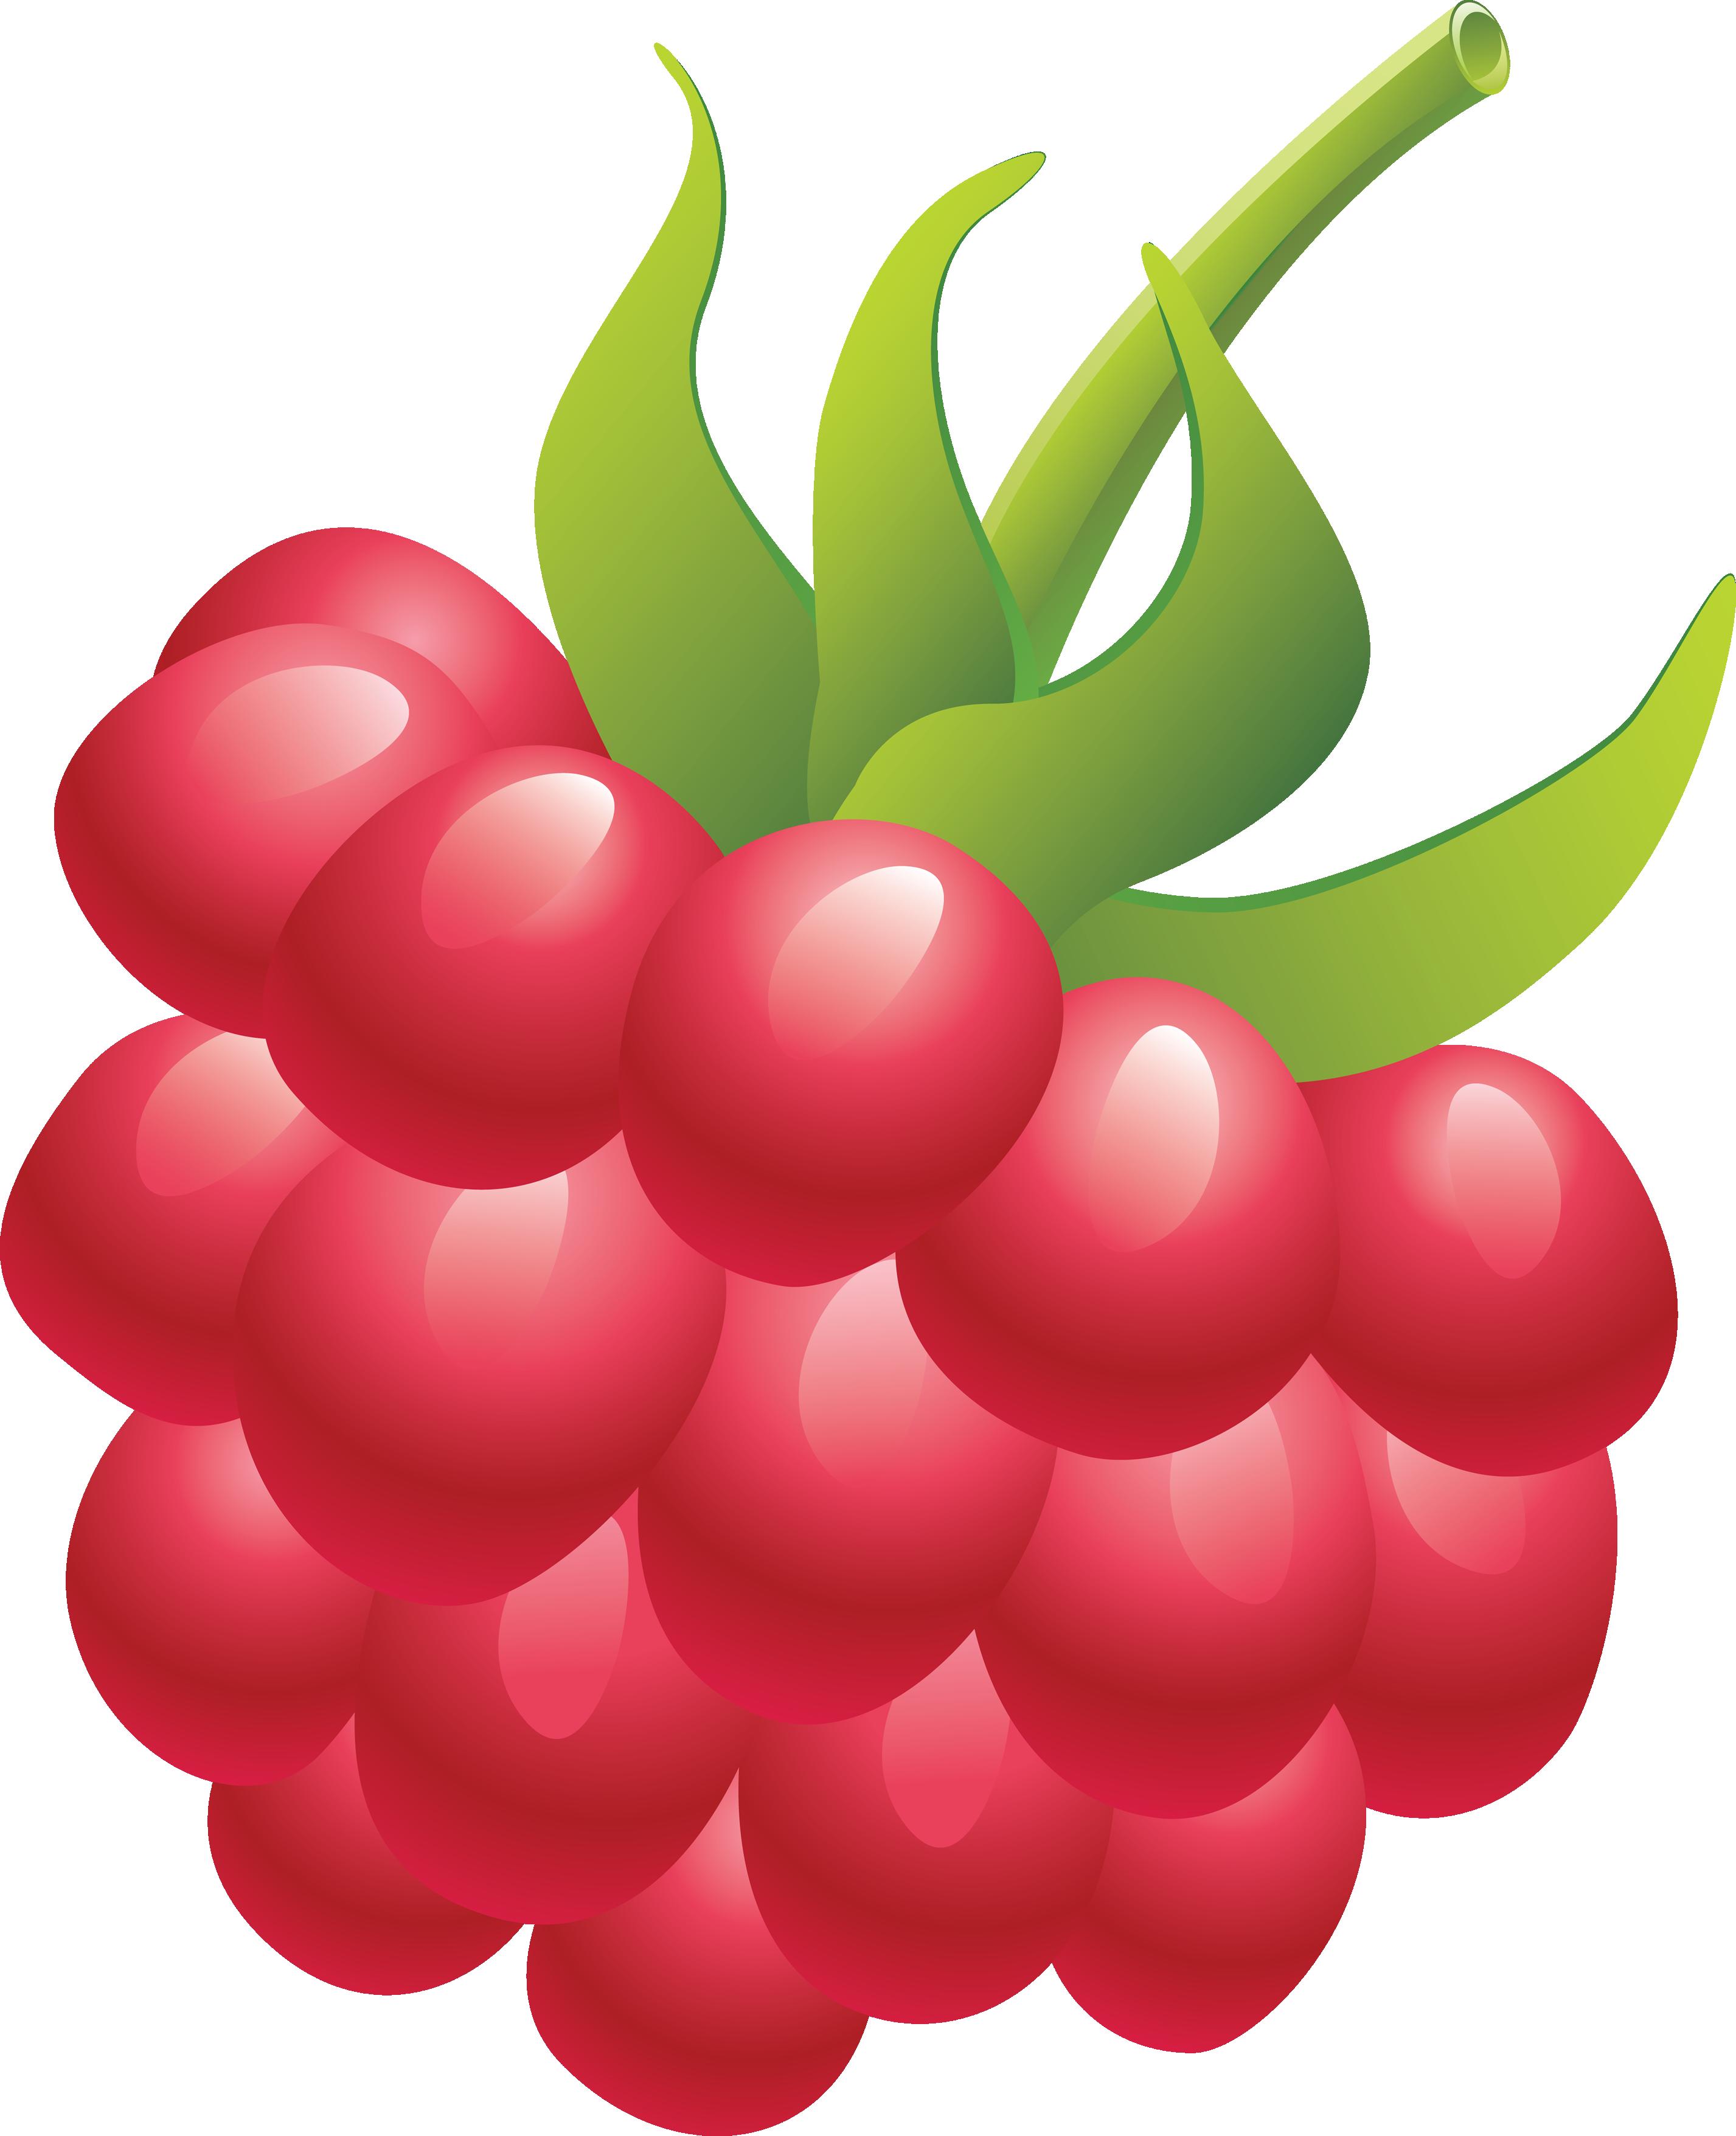 Rapsberry clipart Rraspberry download free Raspberry image